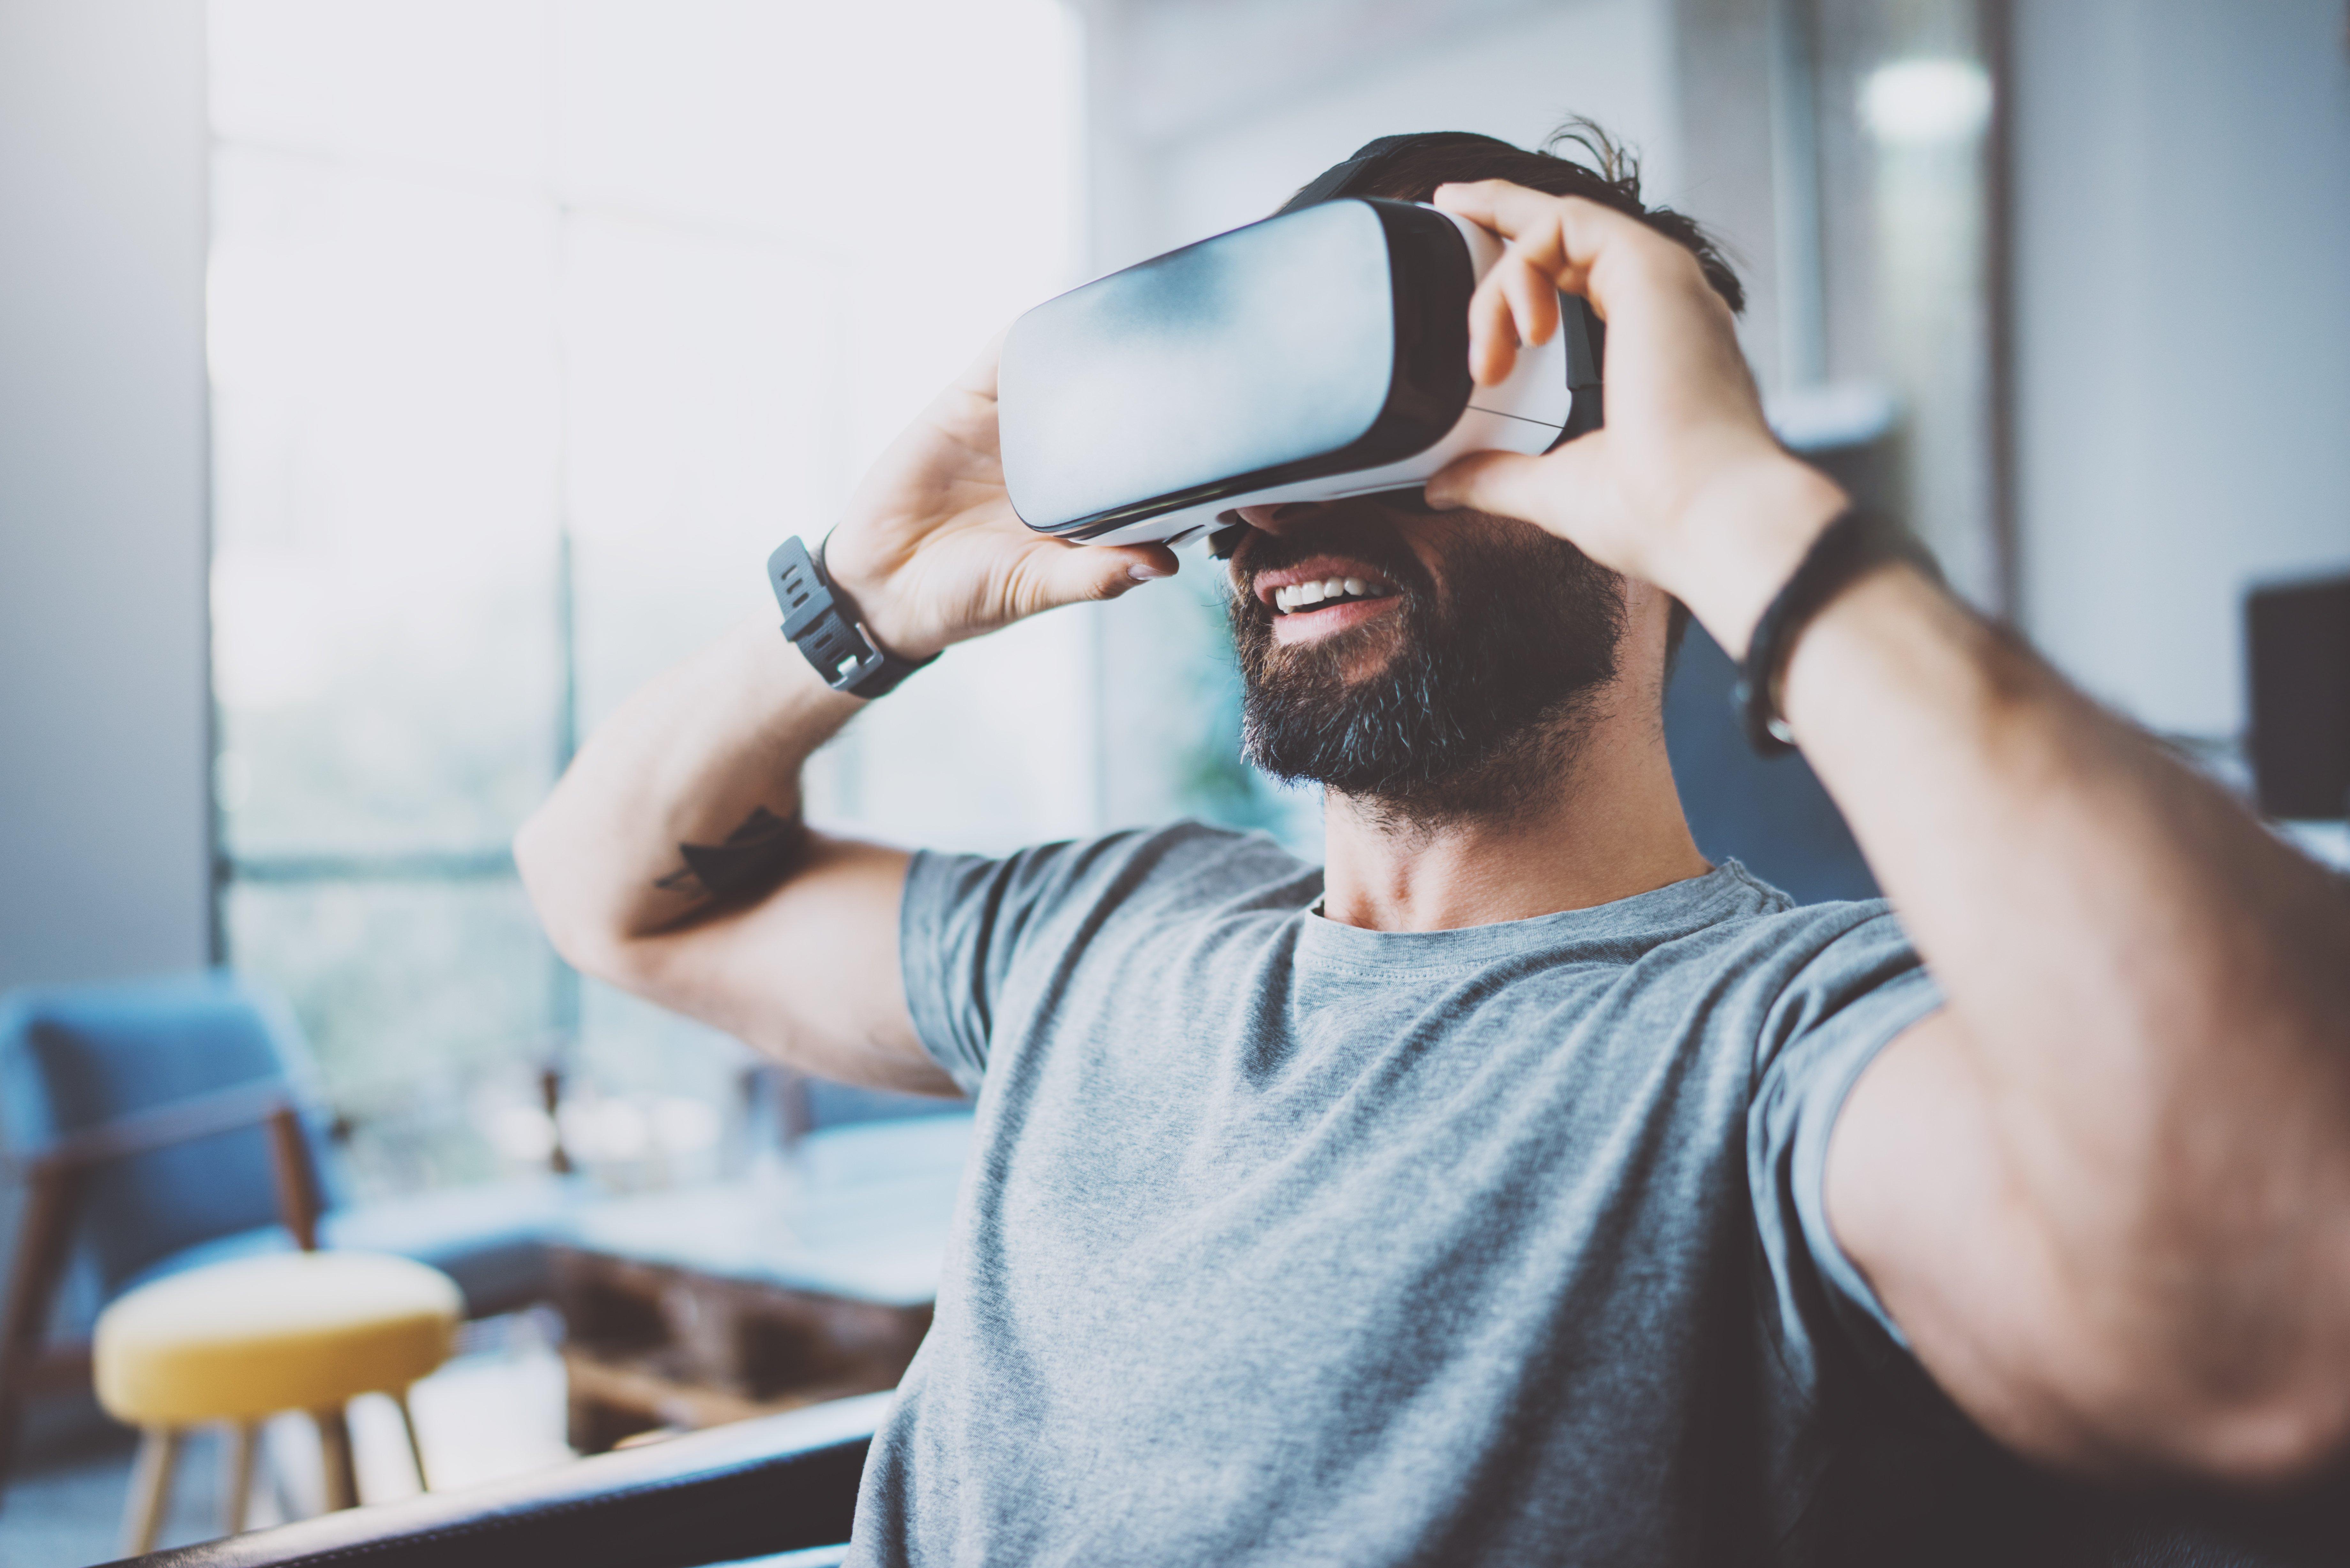 phygital reality man wearing AR virtual reality glasses at home